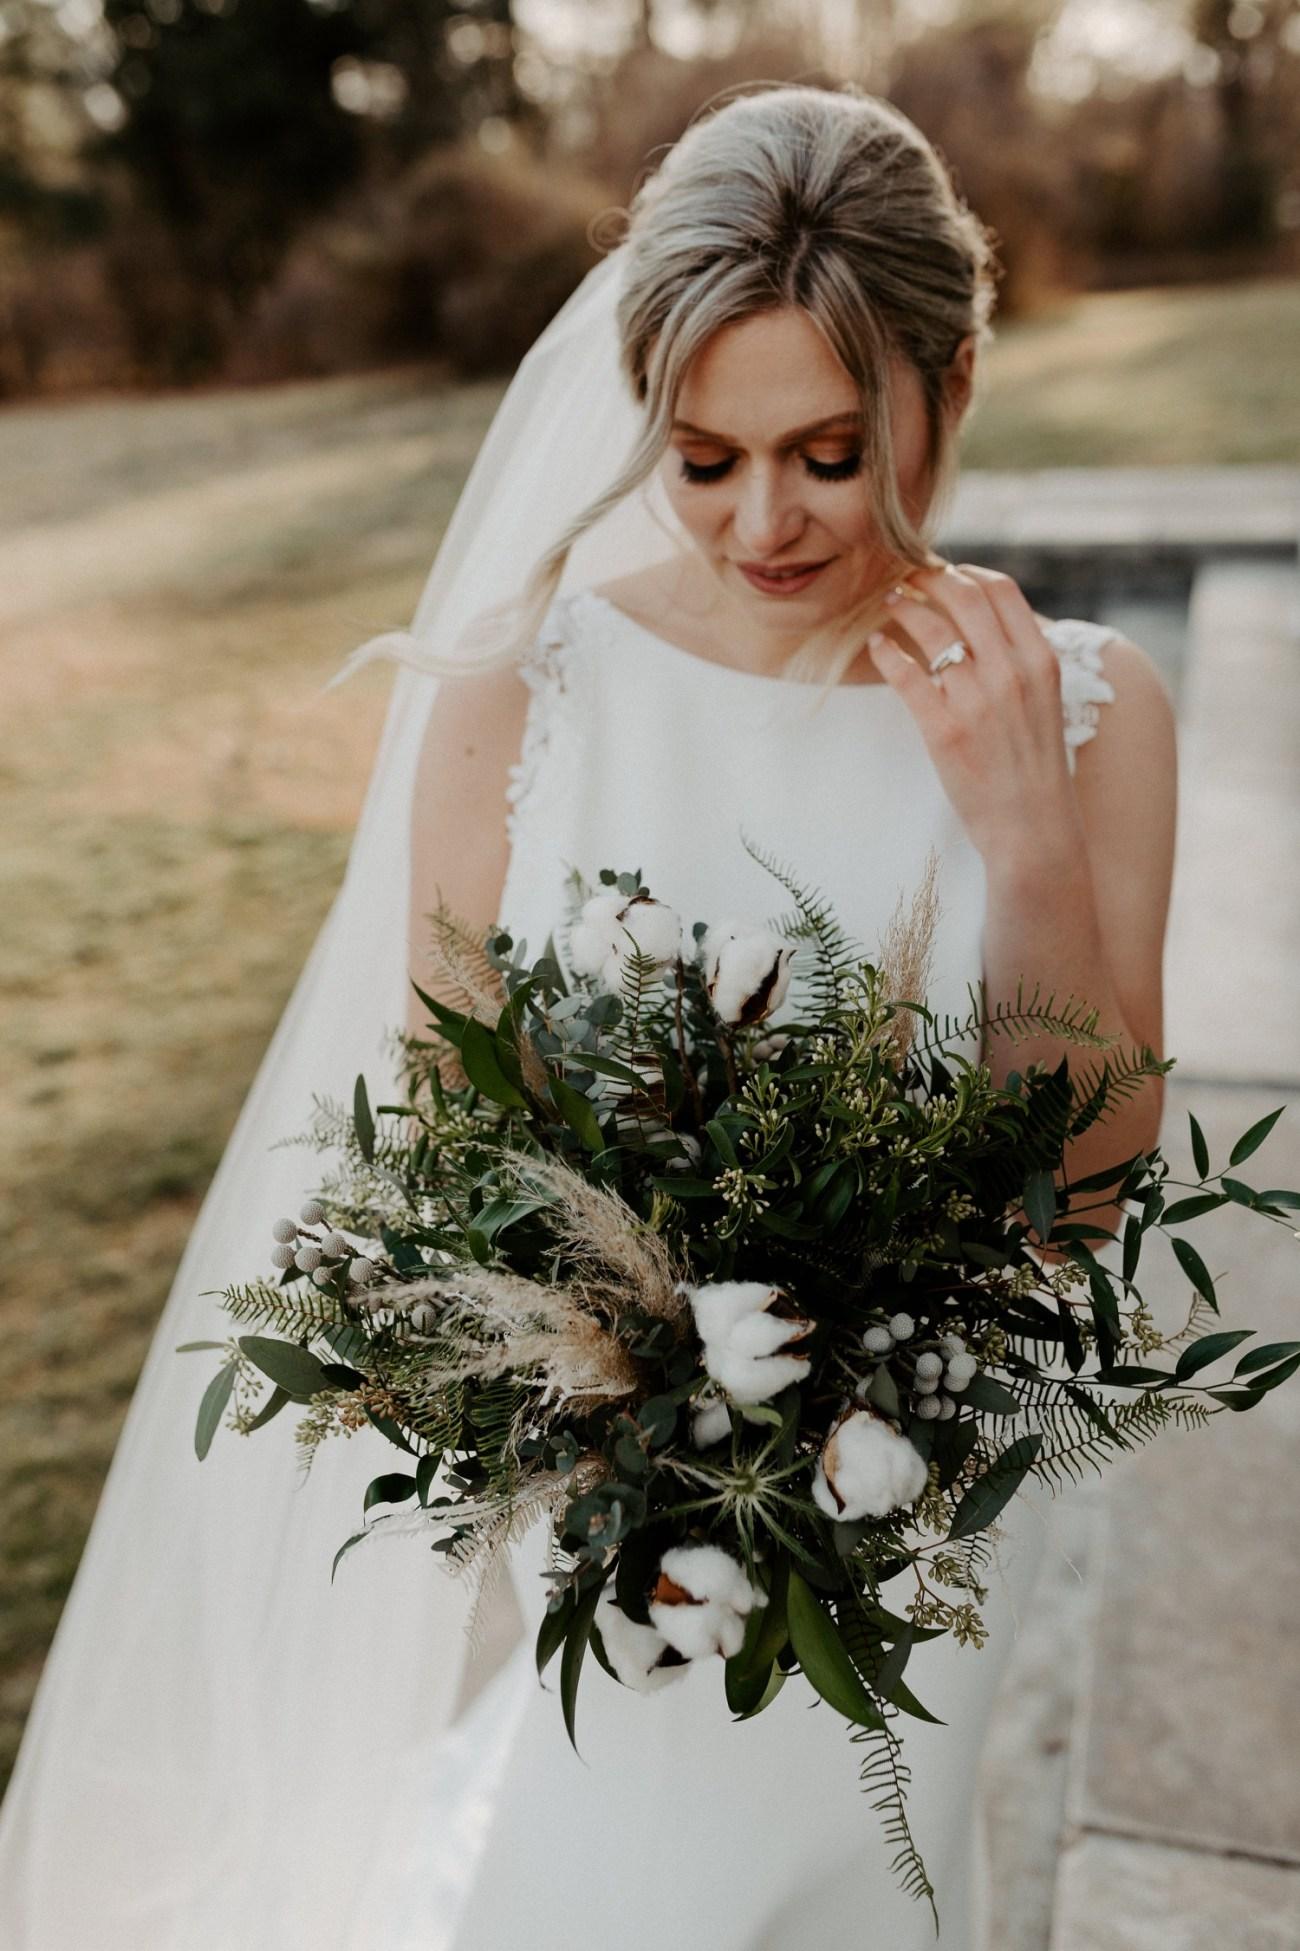 Winter Wedding Bouquet Inspiration Made By Viburnum Designs